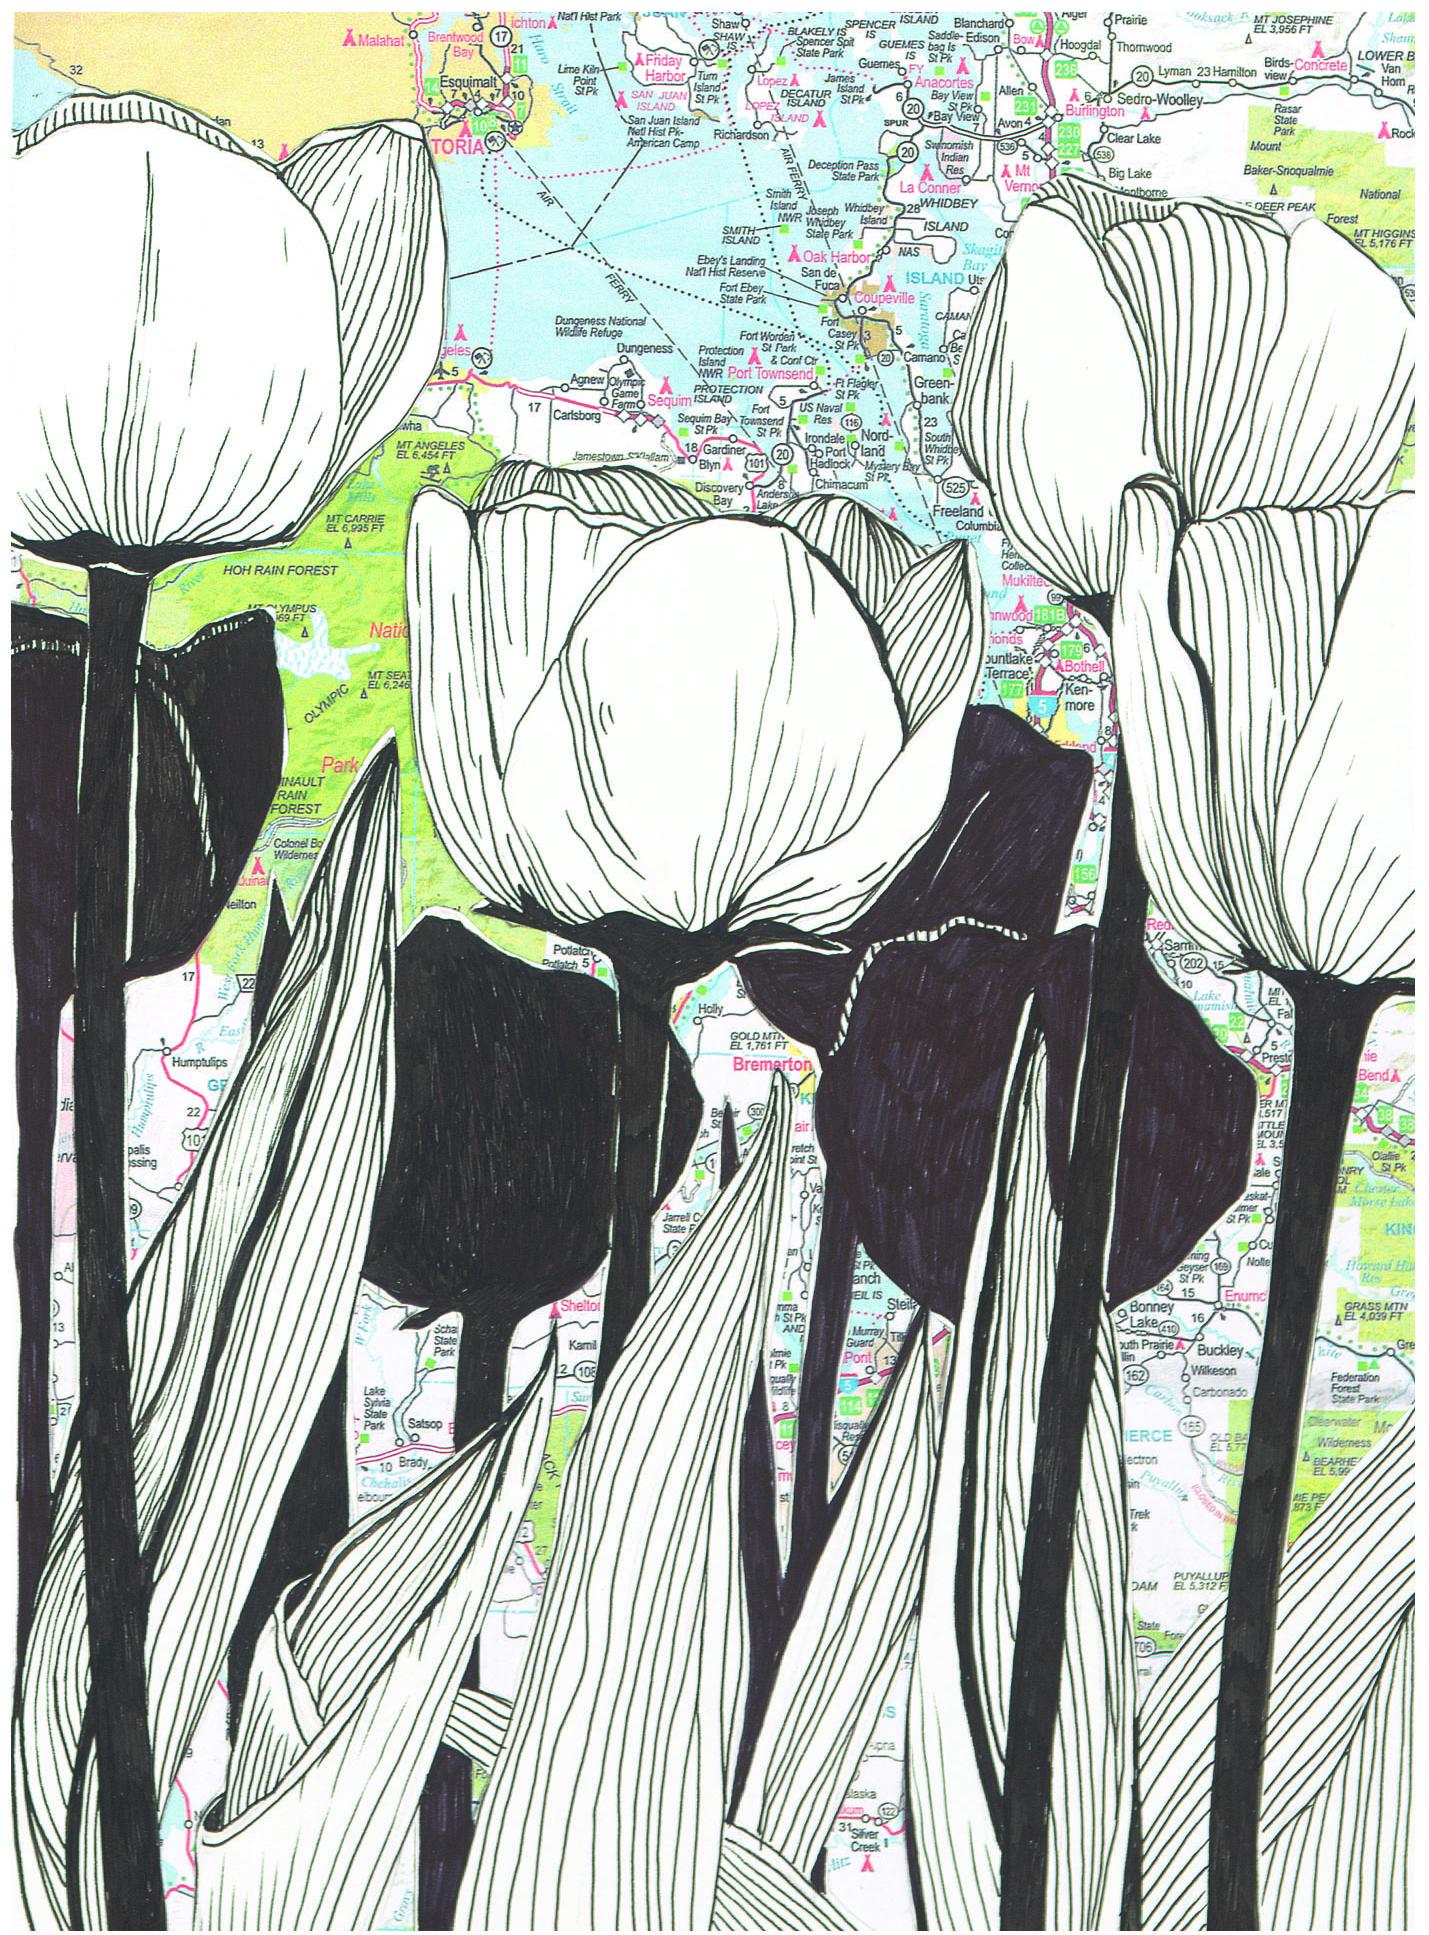 SARR_NW Tulips